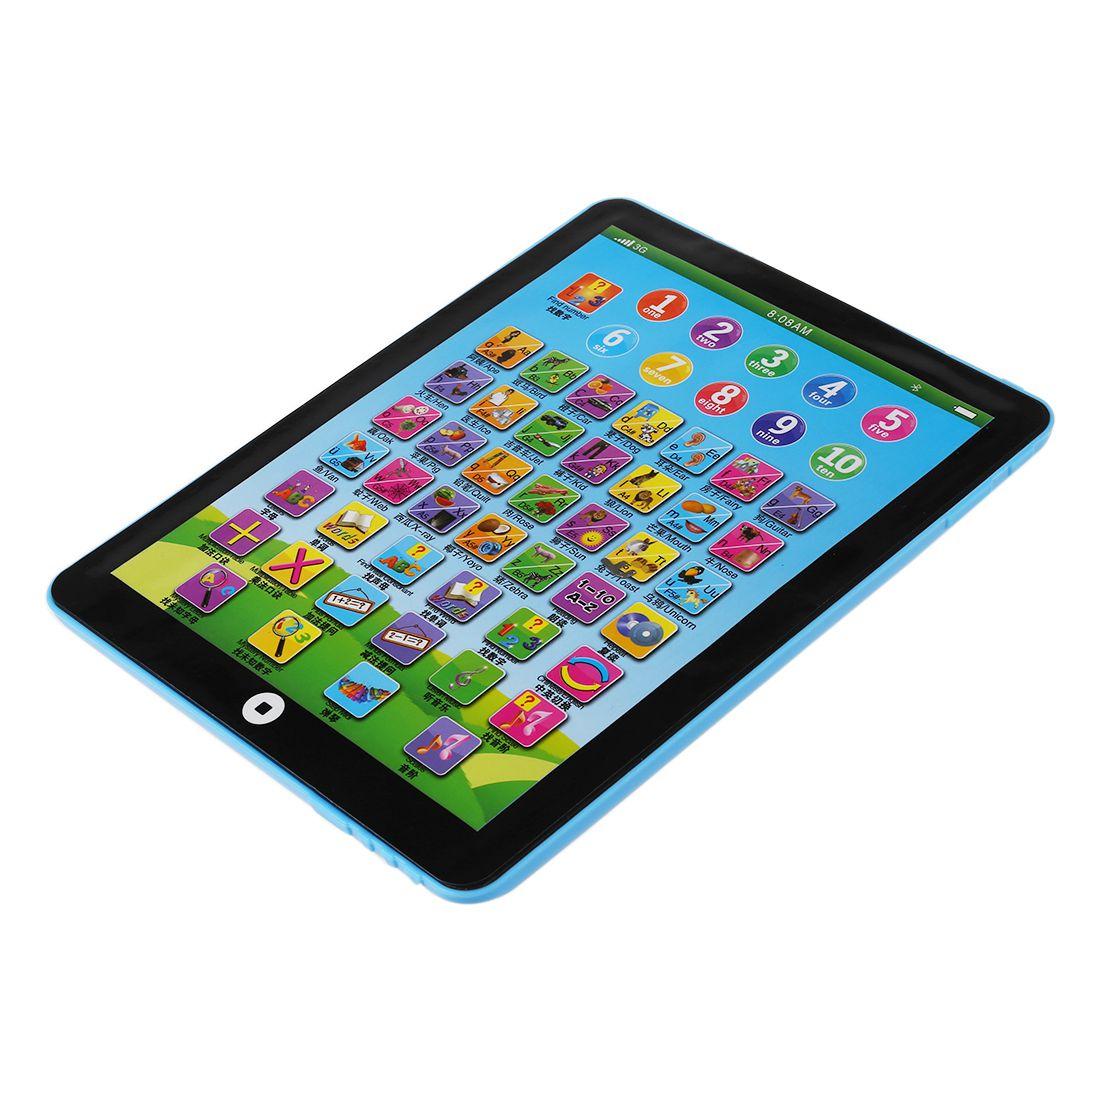 Kinder baby tablet pad computer lernspiel bildung